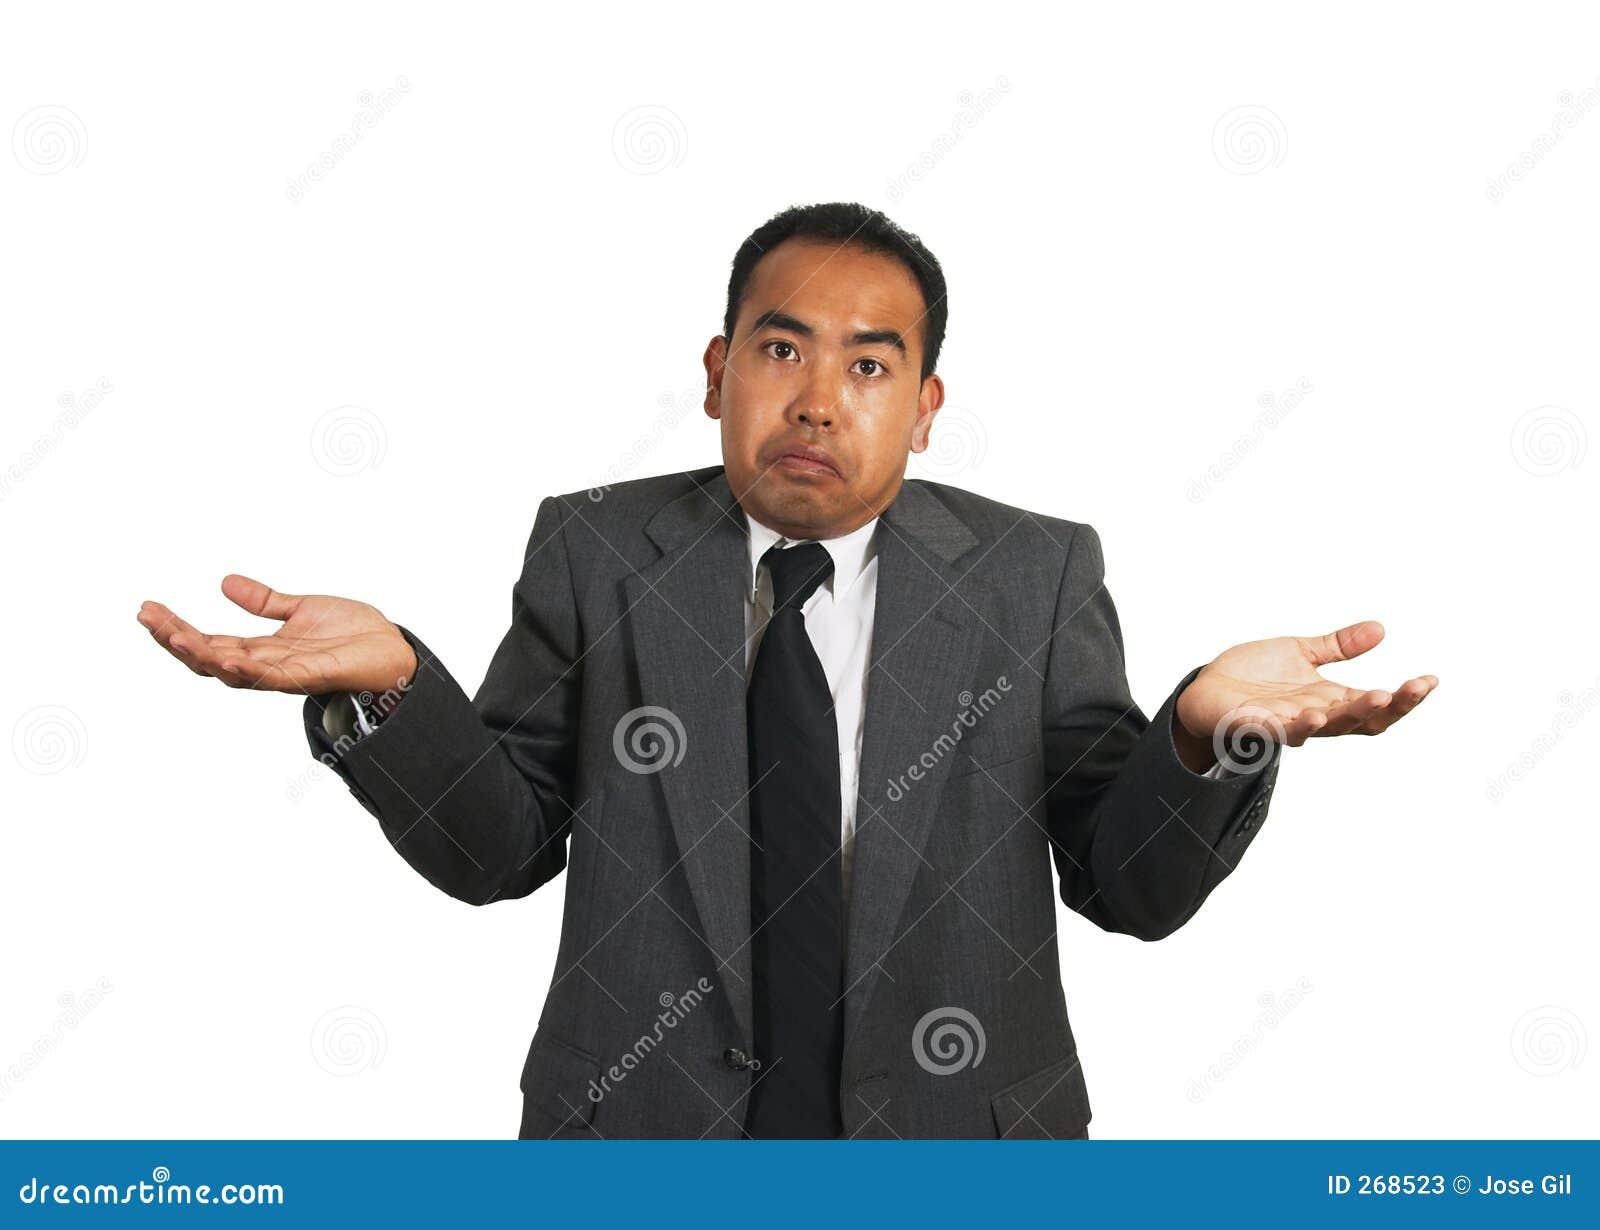 Asian / Asian-American / Filipino / Pilipino man in a business suit ...